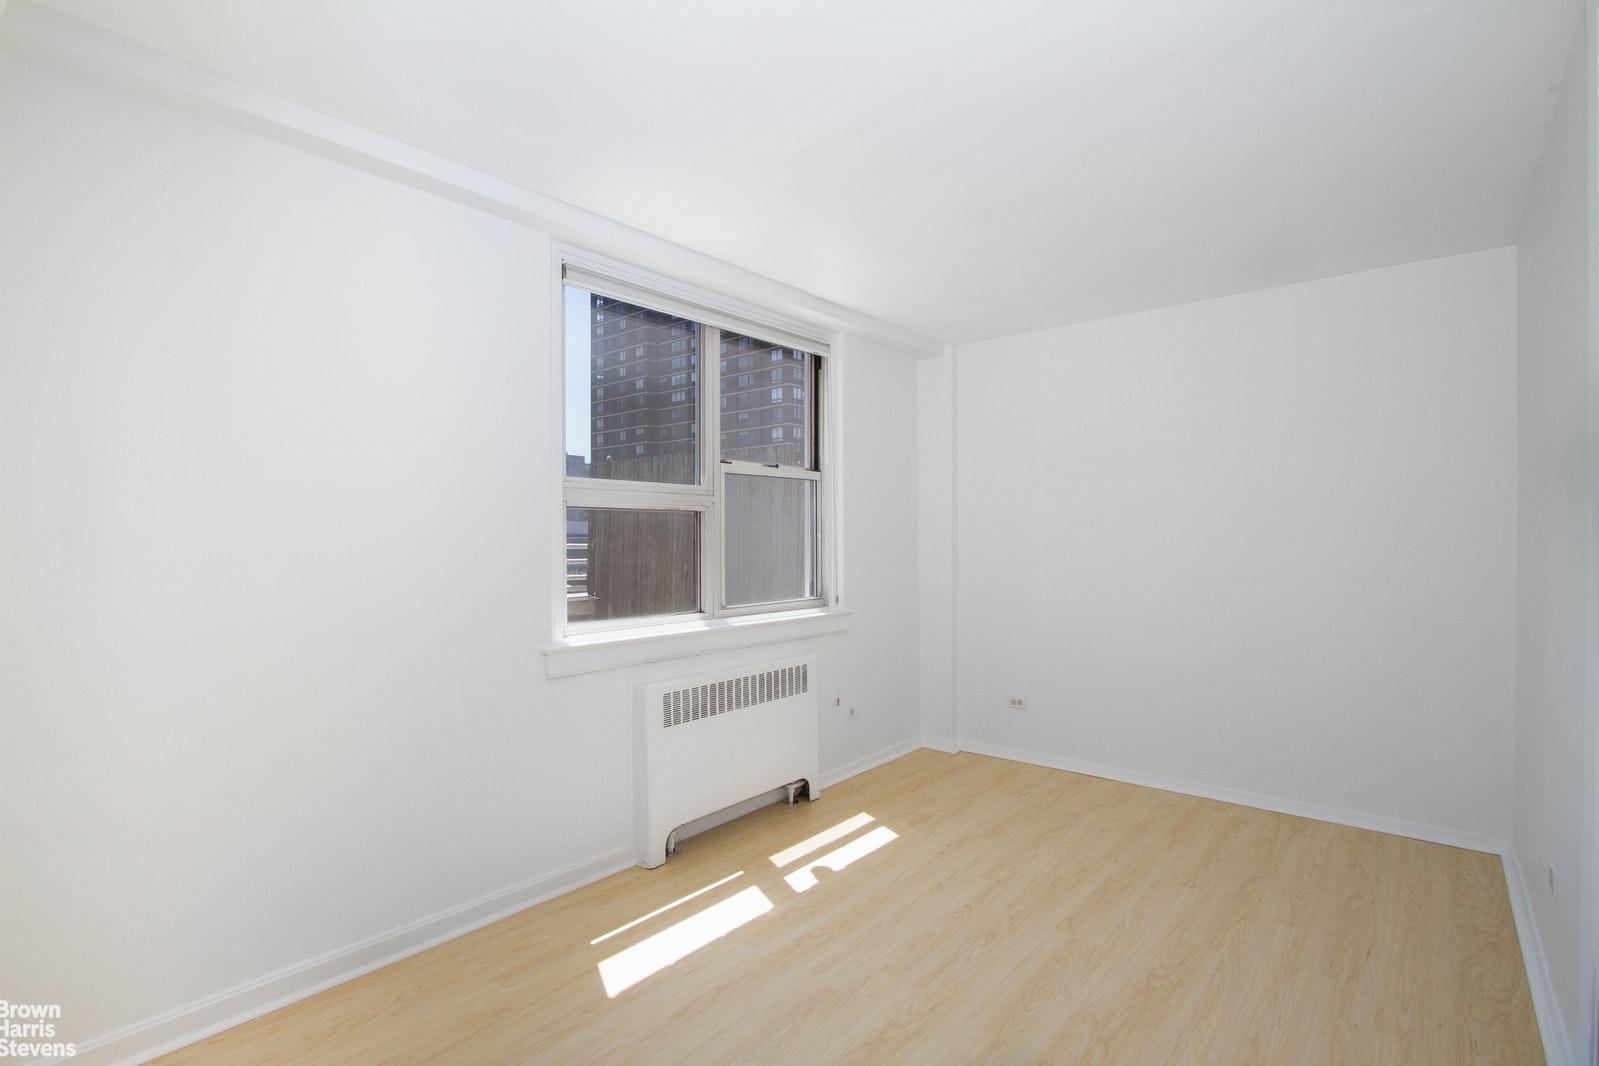 240 EAST 35TH STREET 11A, Midtown East, $899,000, Web #: 20174645